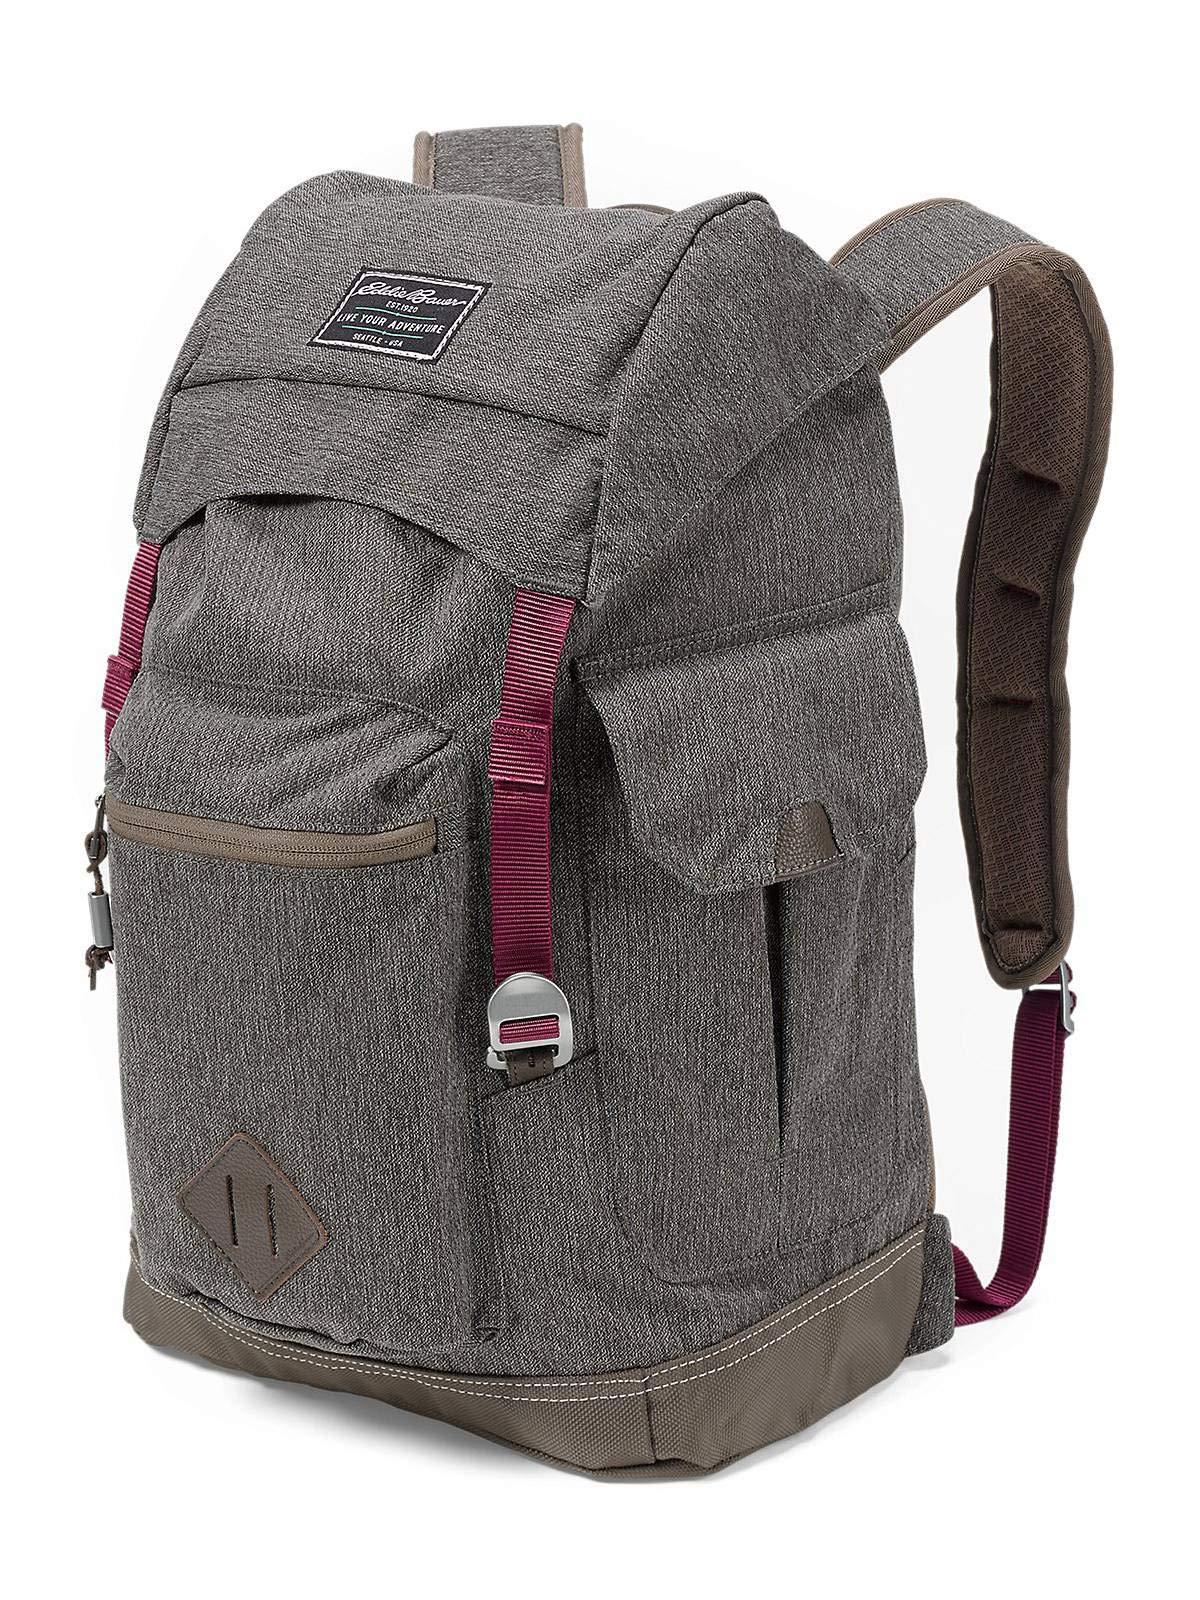 9cb580bbe9 Amazon.com  Eddie Bauer  Backpacks